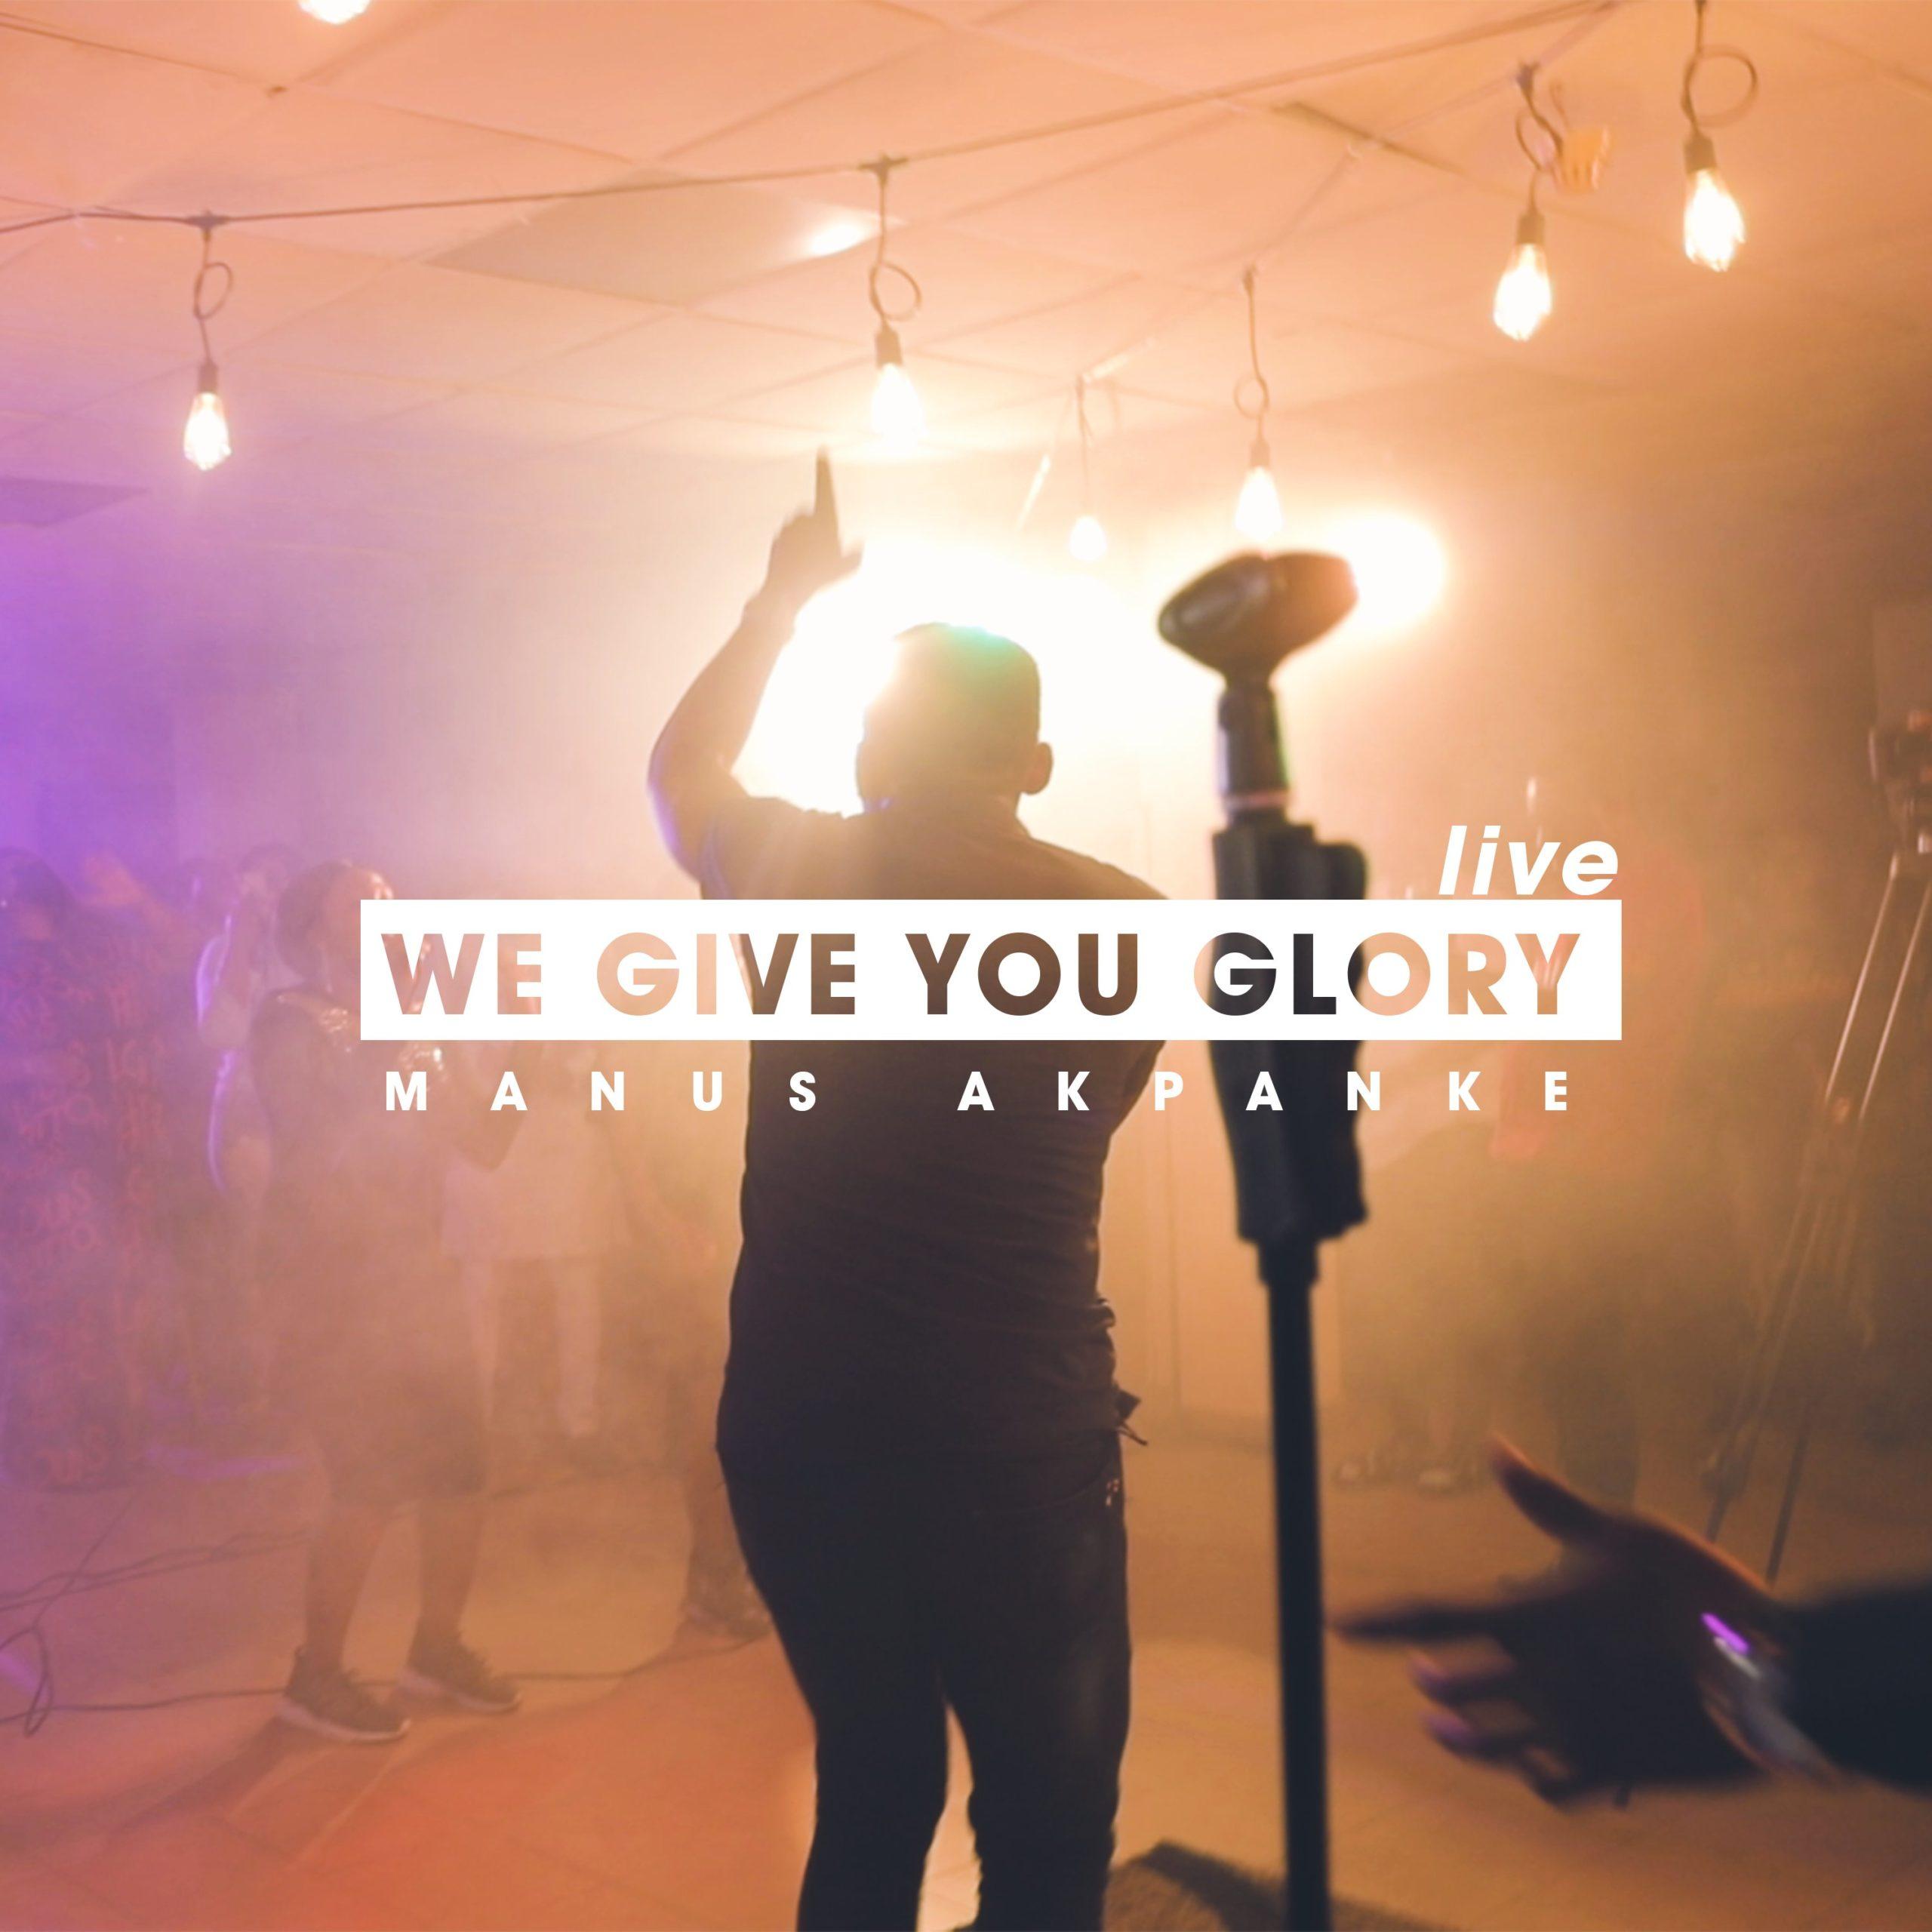 DOWNLOAD Music: Manus Akpanke – We Give you Glory (LIVE)